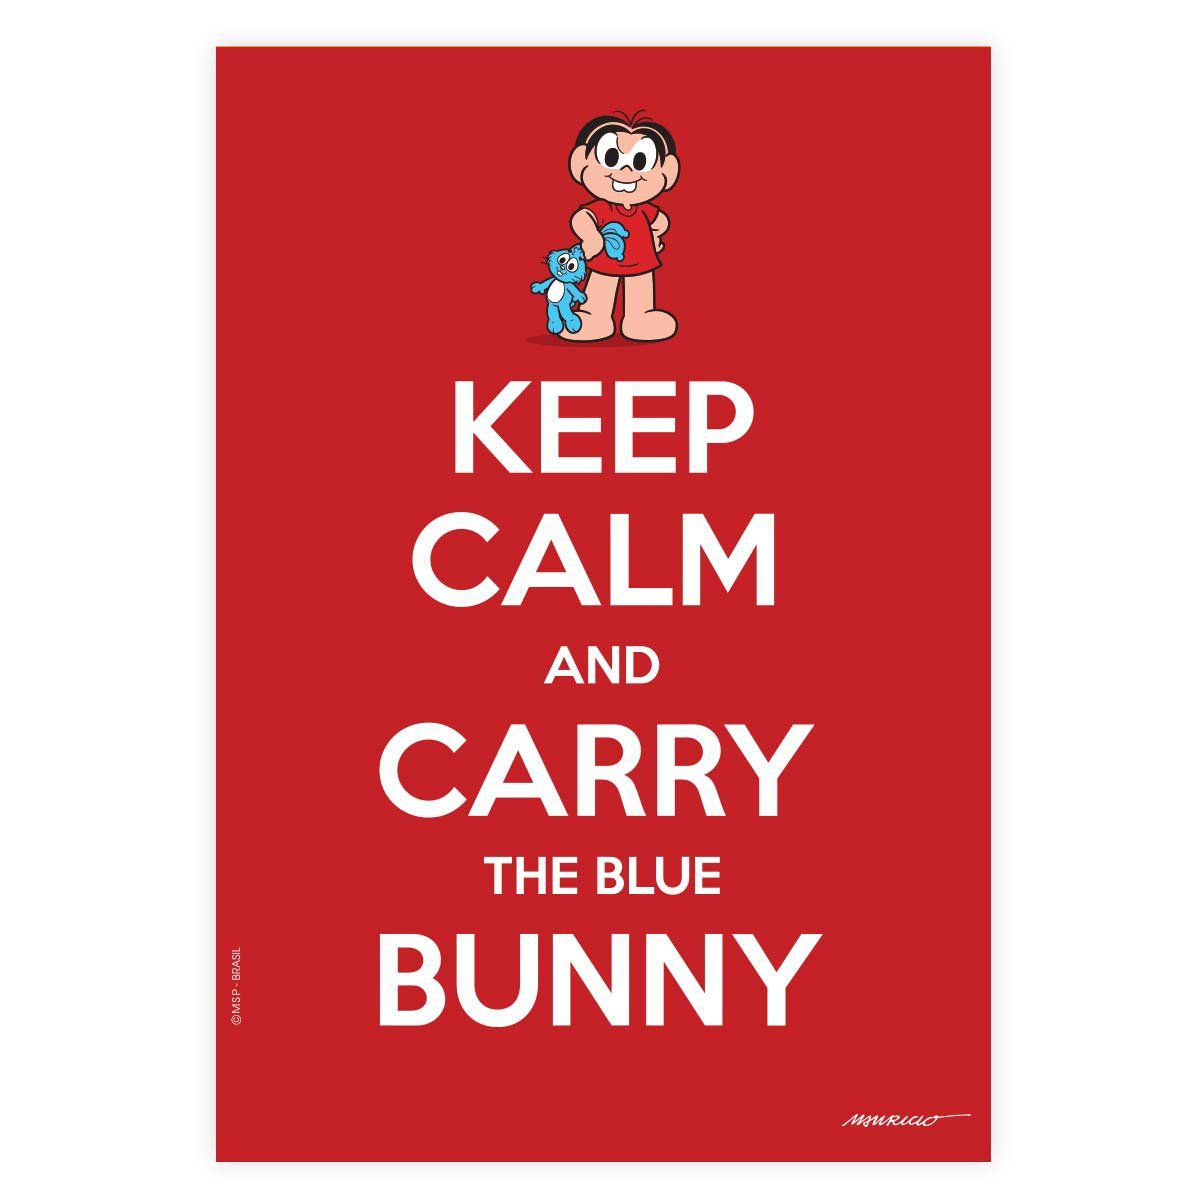 Pôster Turma da Mônica Cool - Keep Calm And Carry The Blue Bunny